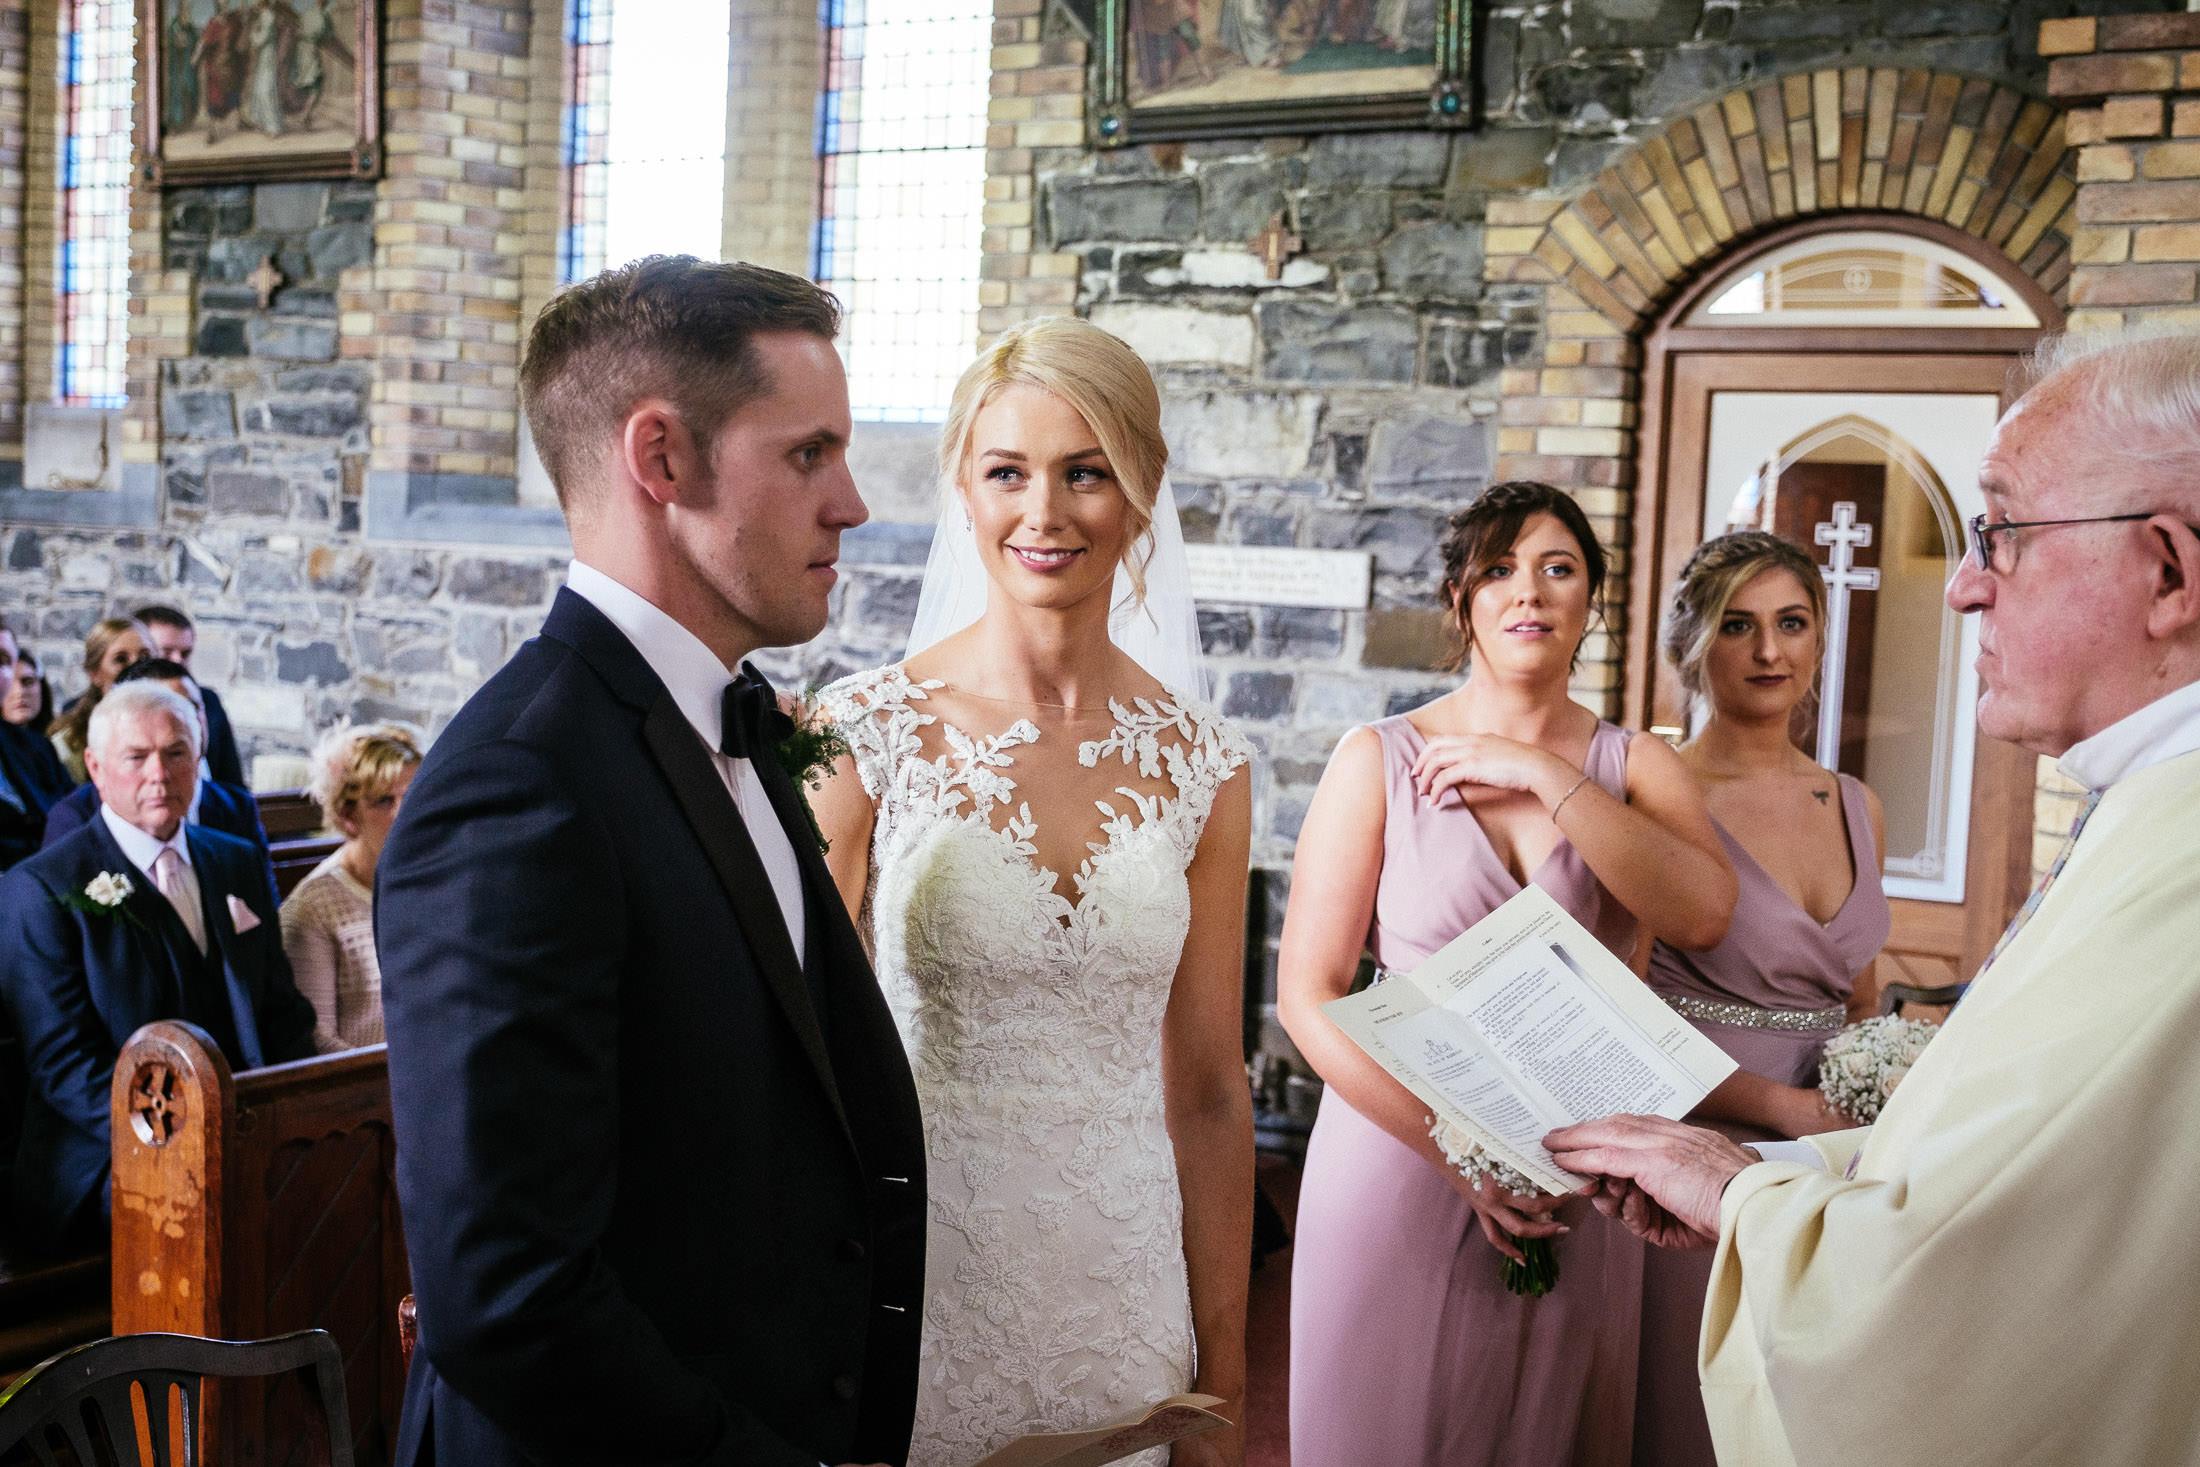 Knightsbrook Hotel Trim Castle Wedding Photographer 44